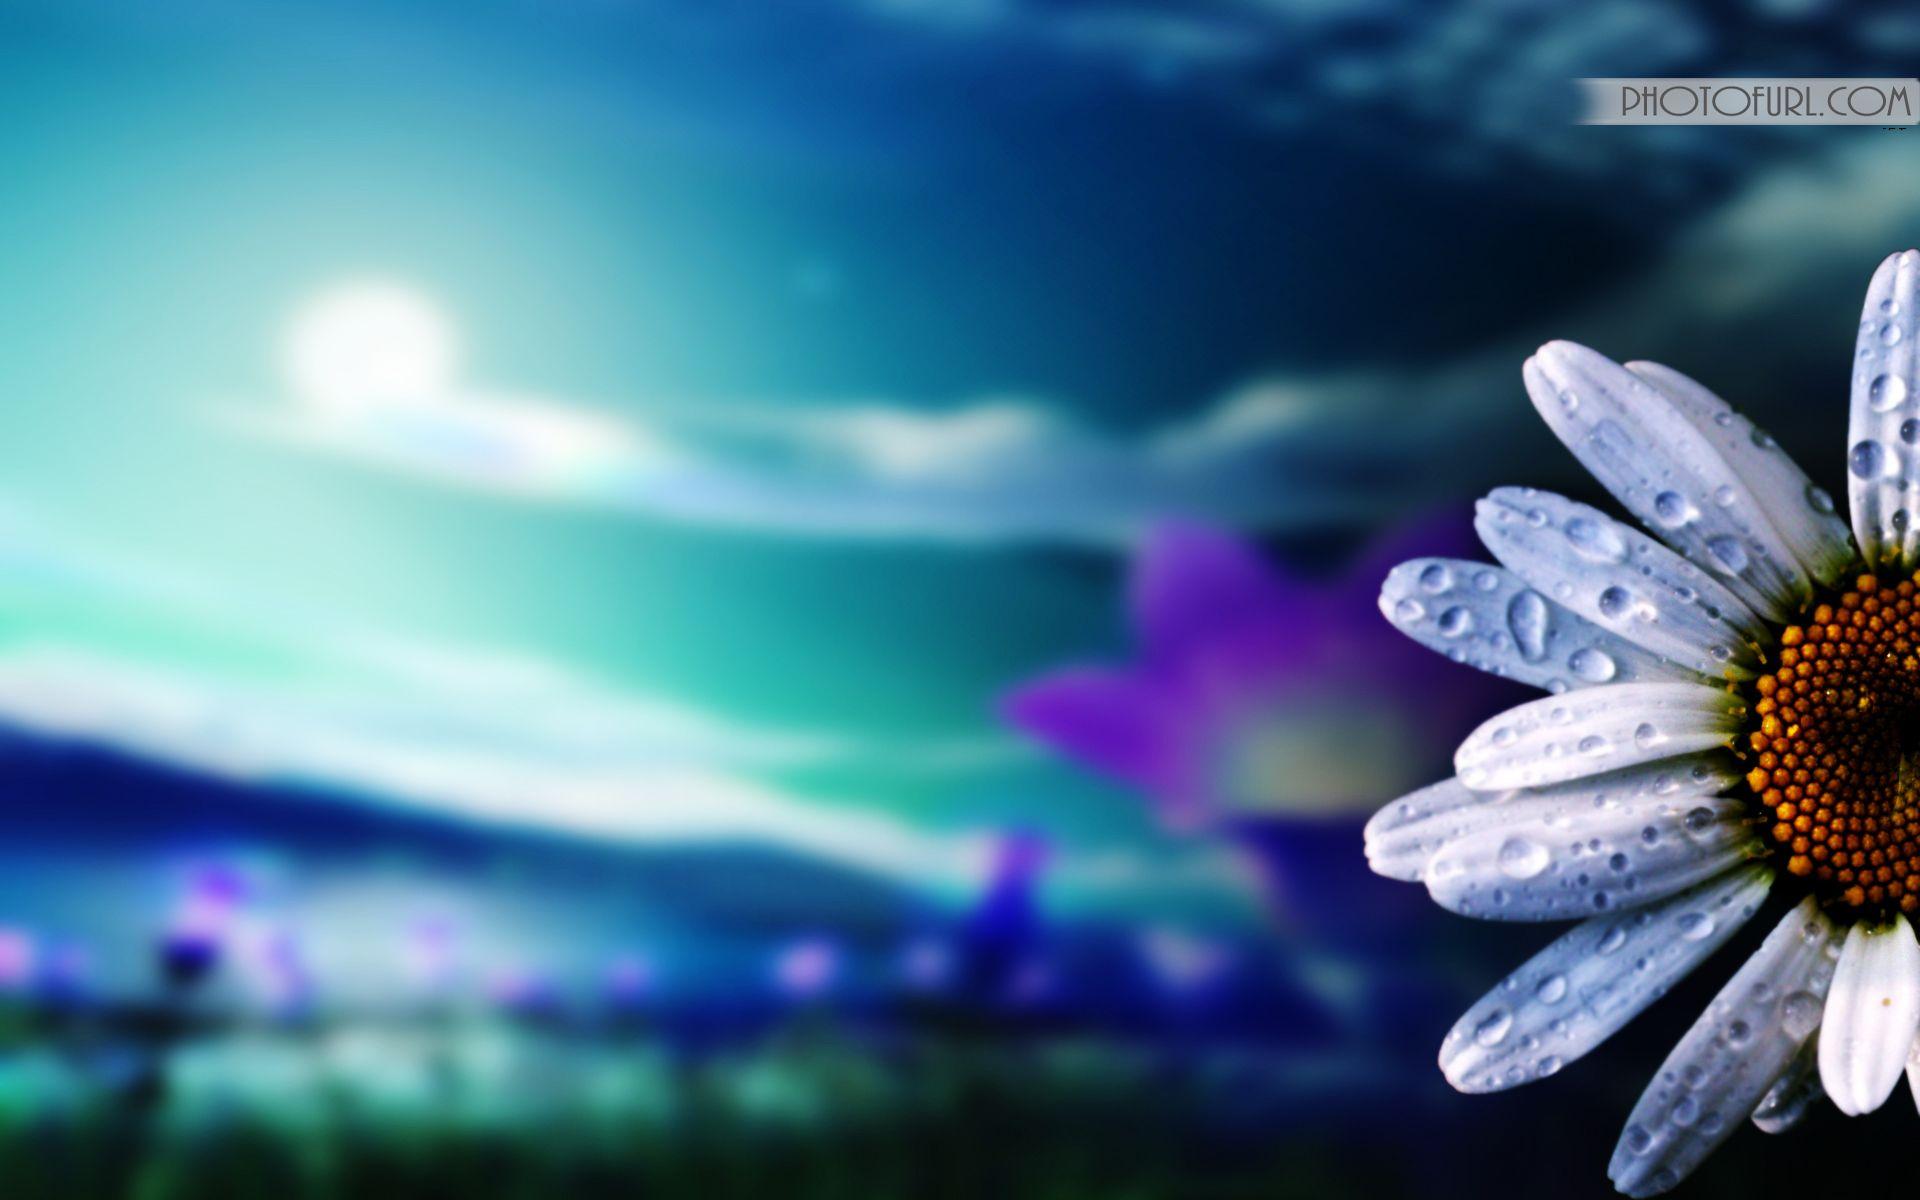 Beautiful Flowers Colourful Wallpaper Wallpapers Desktop